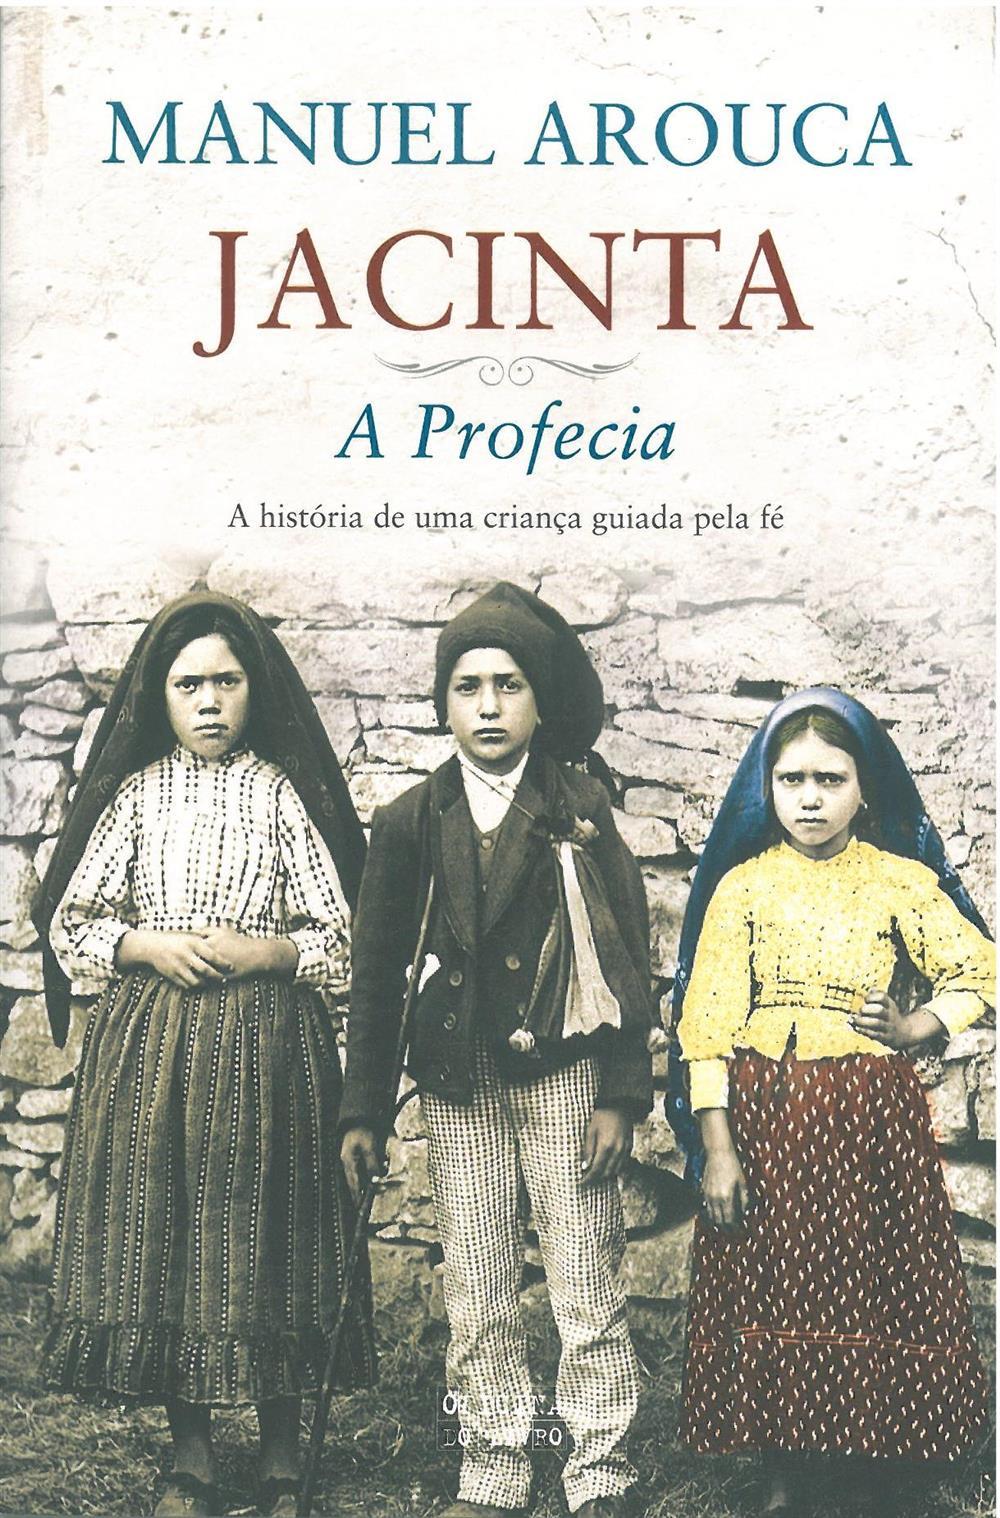 Jacinta_a profecia.jpg